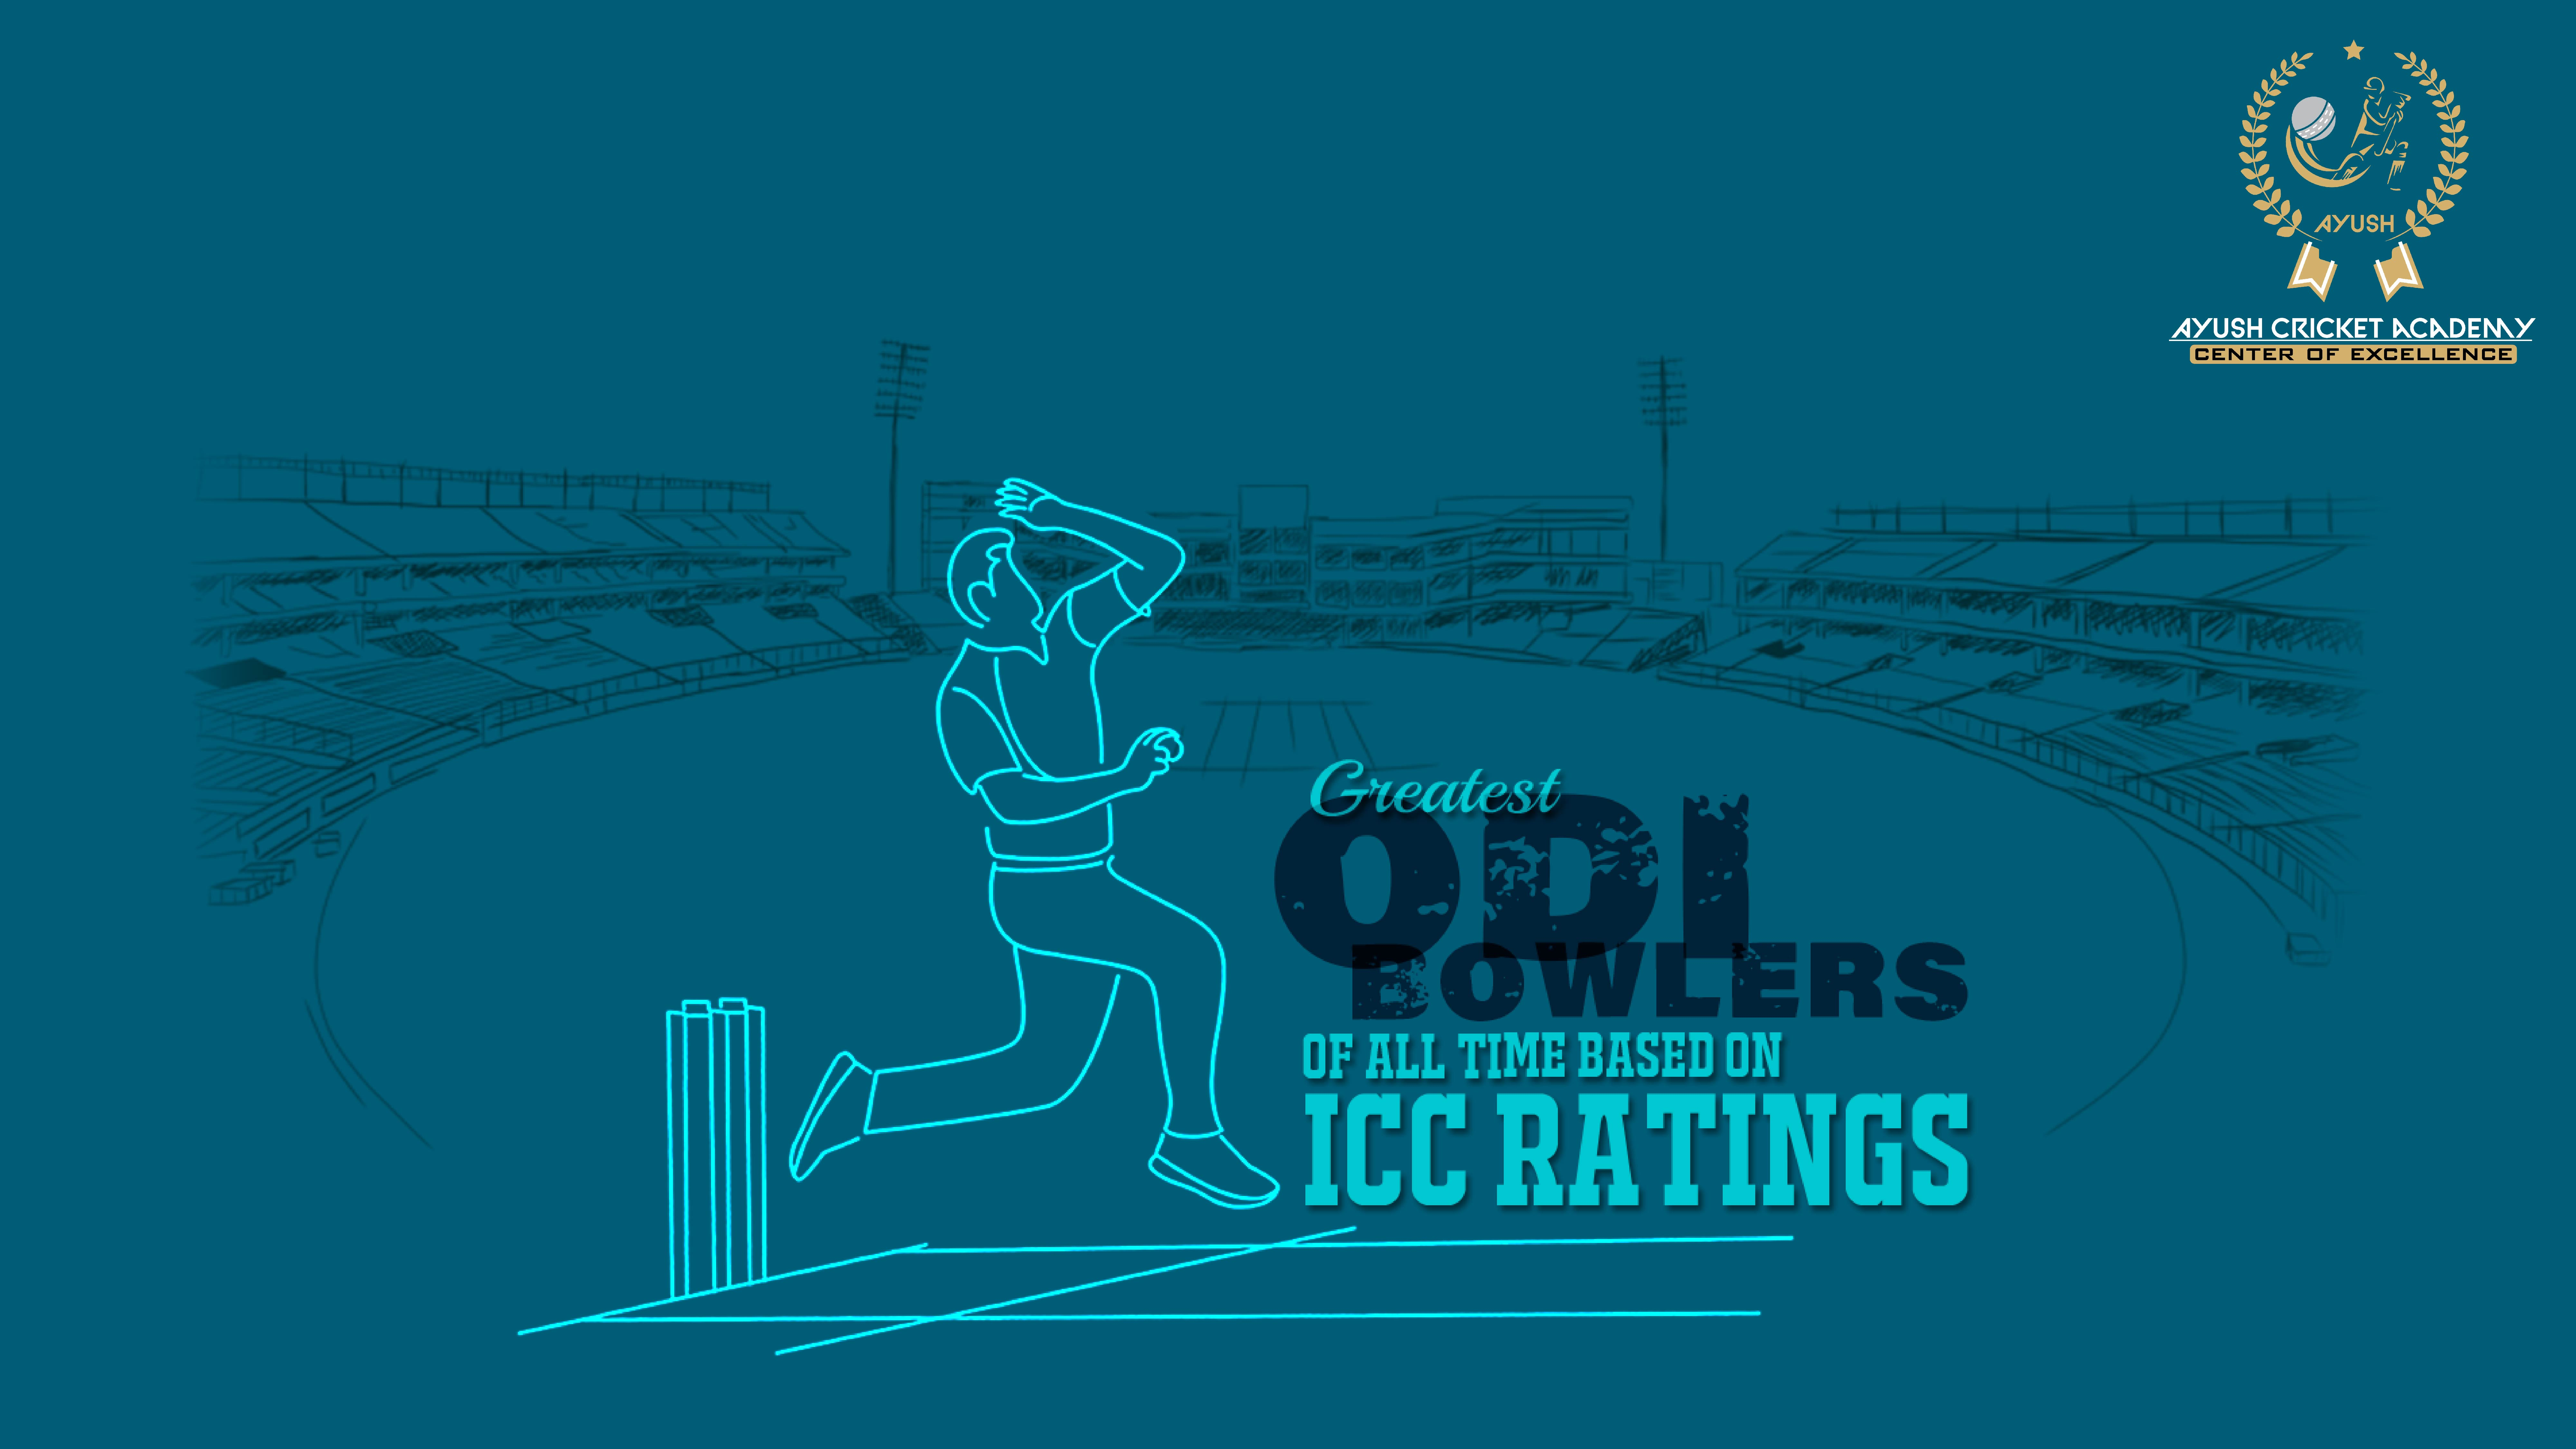 best residential cricket academy Dehradun